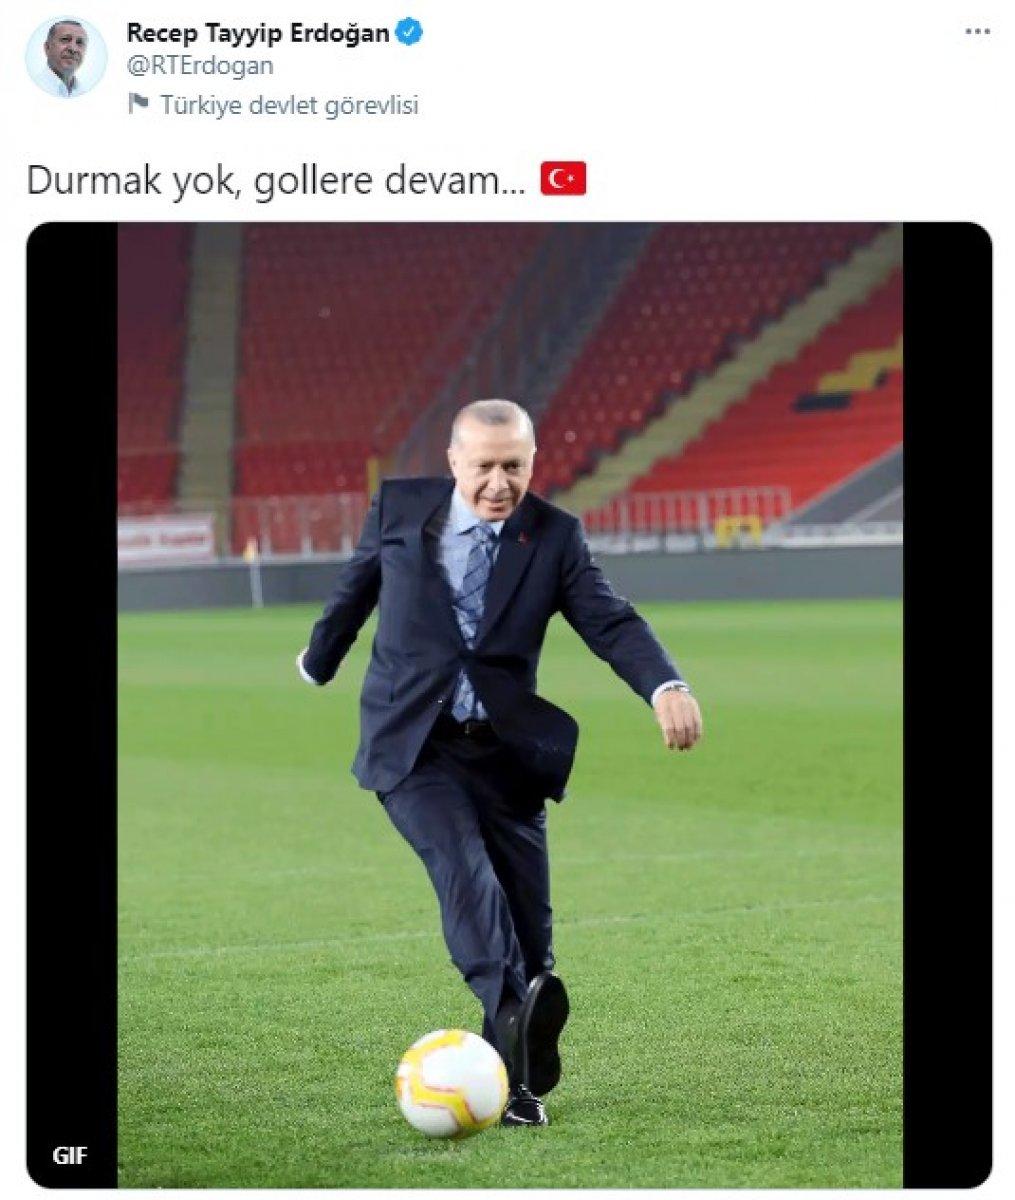 Cumhurbaşkanı Erdoğan dan gol paylaşımı #1